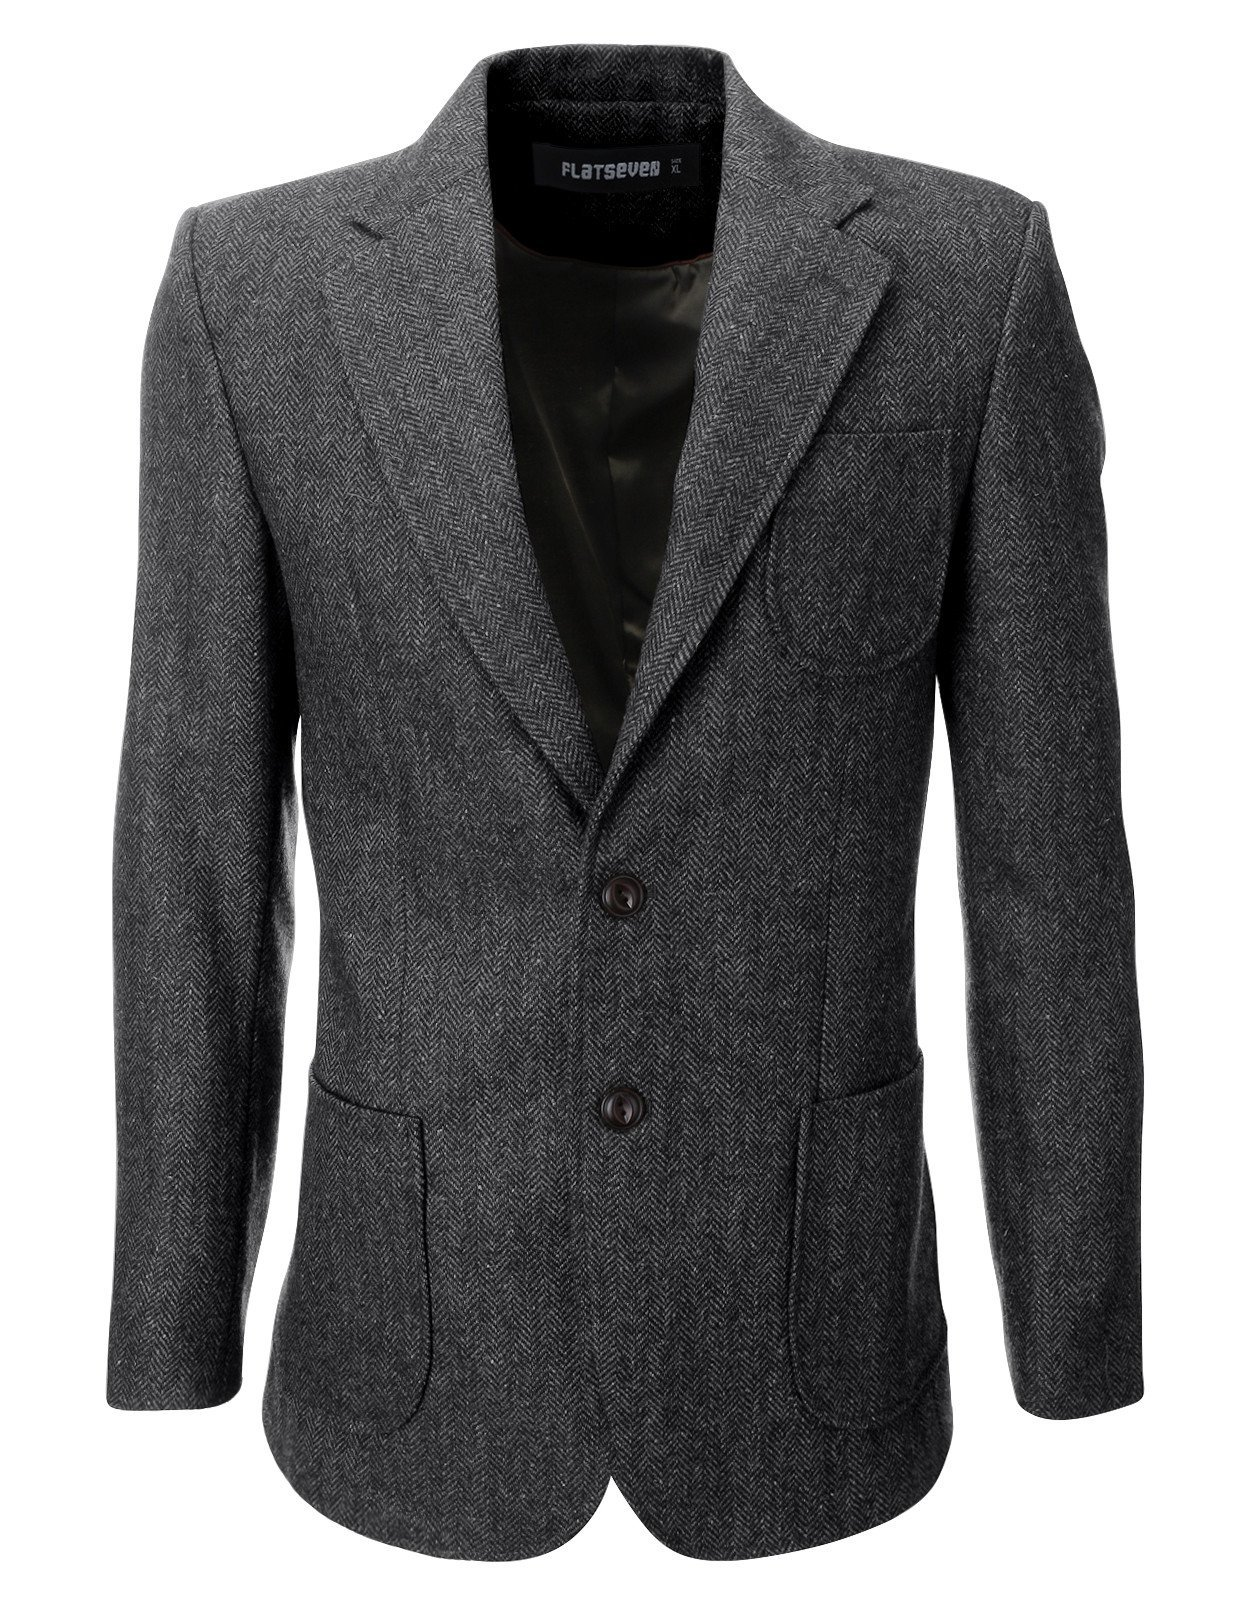 FLATSEVEN Mens Herringbone Wool Blazer Jacket With Elbow Patches (BJ902) Grey, M